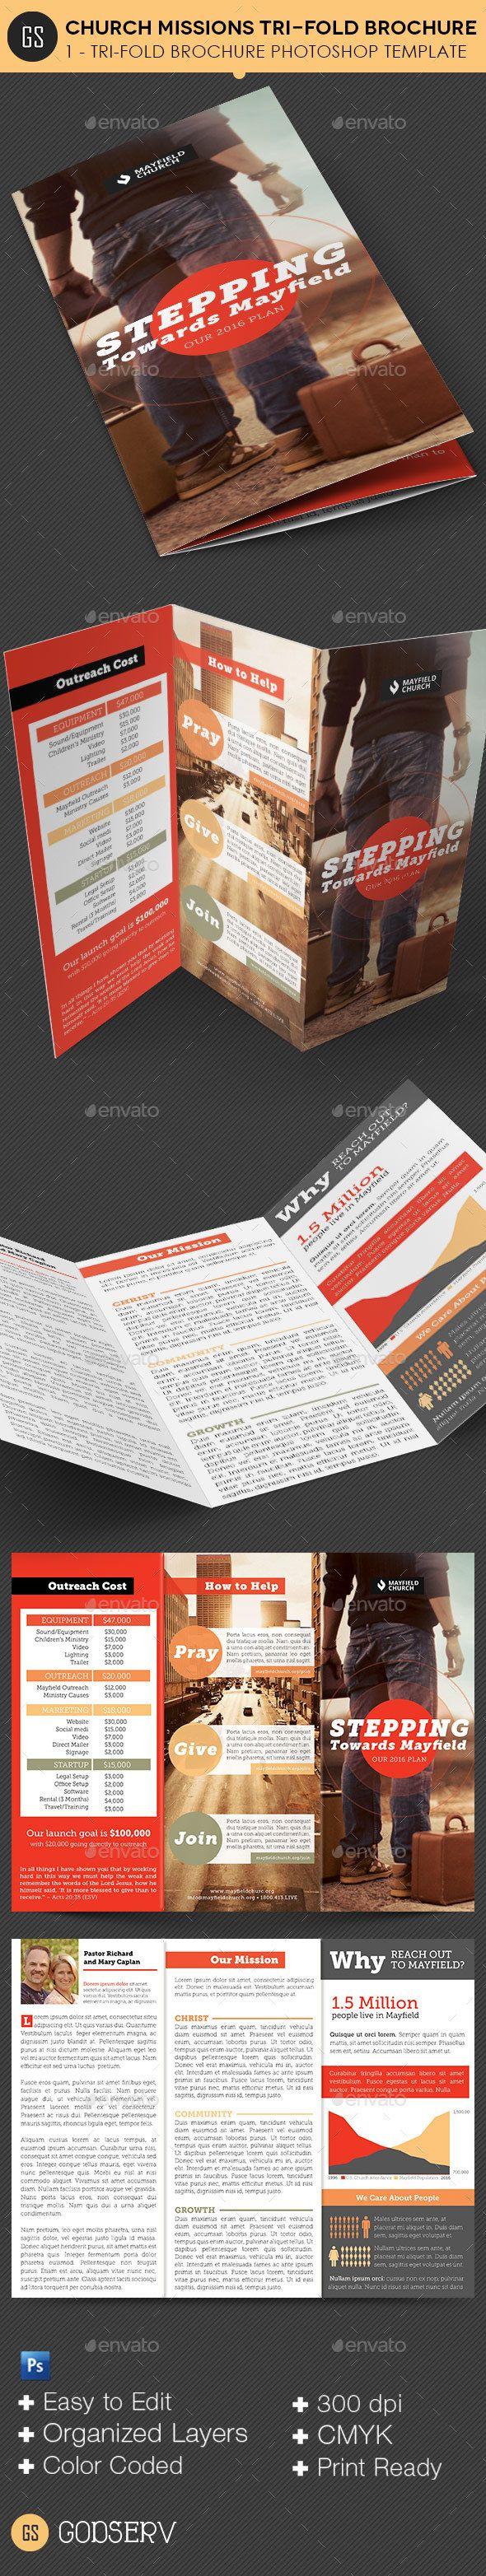 Best Brochure Templates Images On Pinterest Print Templates - Informational brochure templates